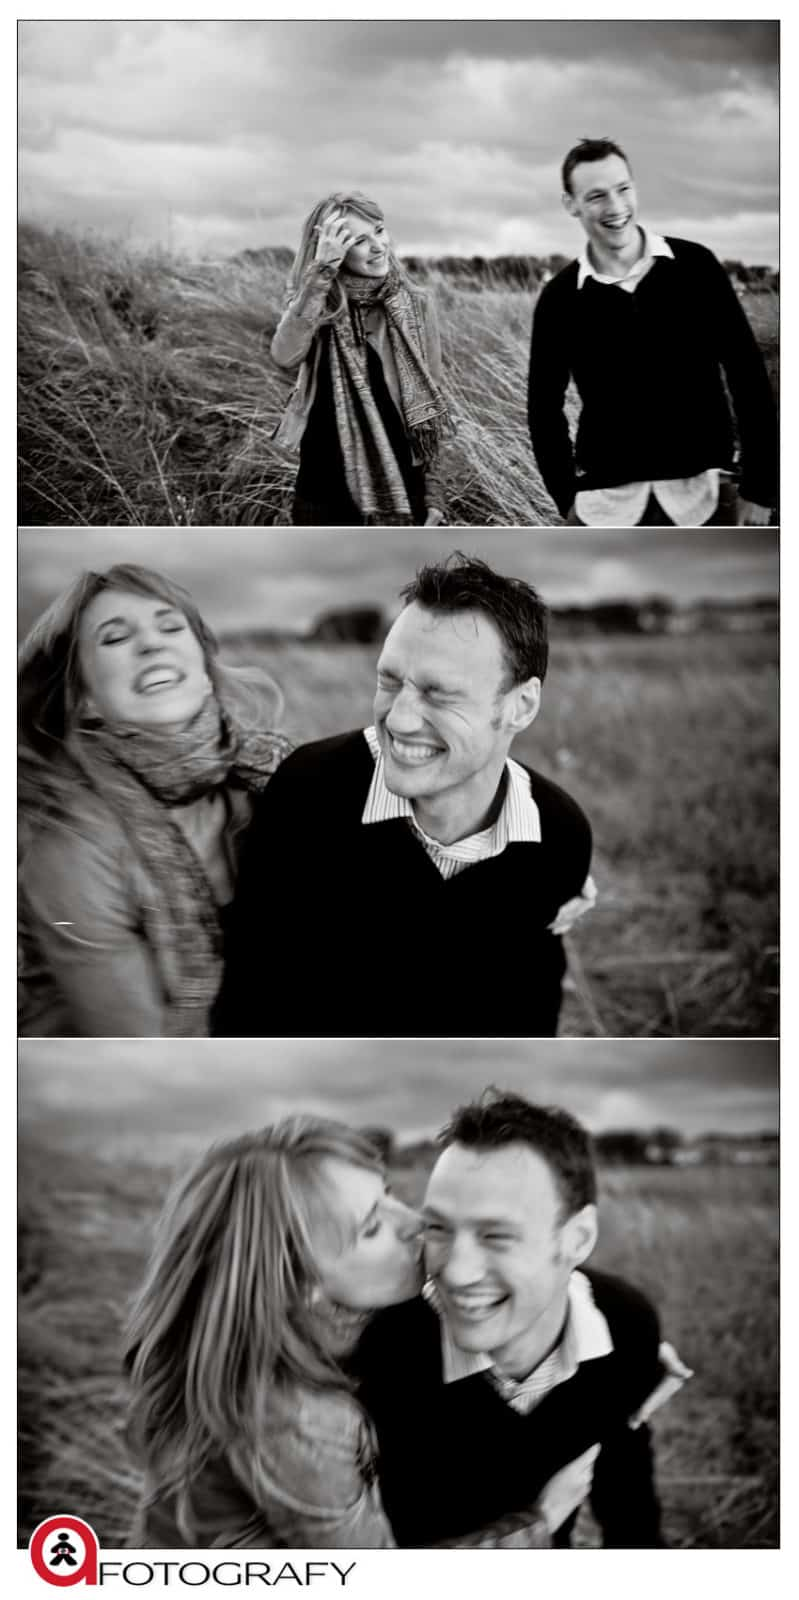 North-berwick-engagement-portrait-photo-session-near-Edinburgh